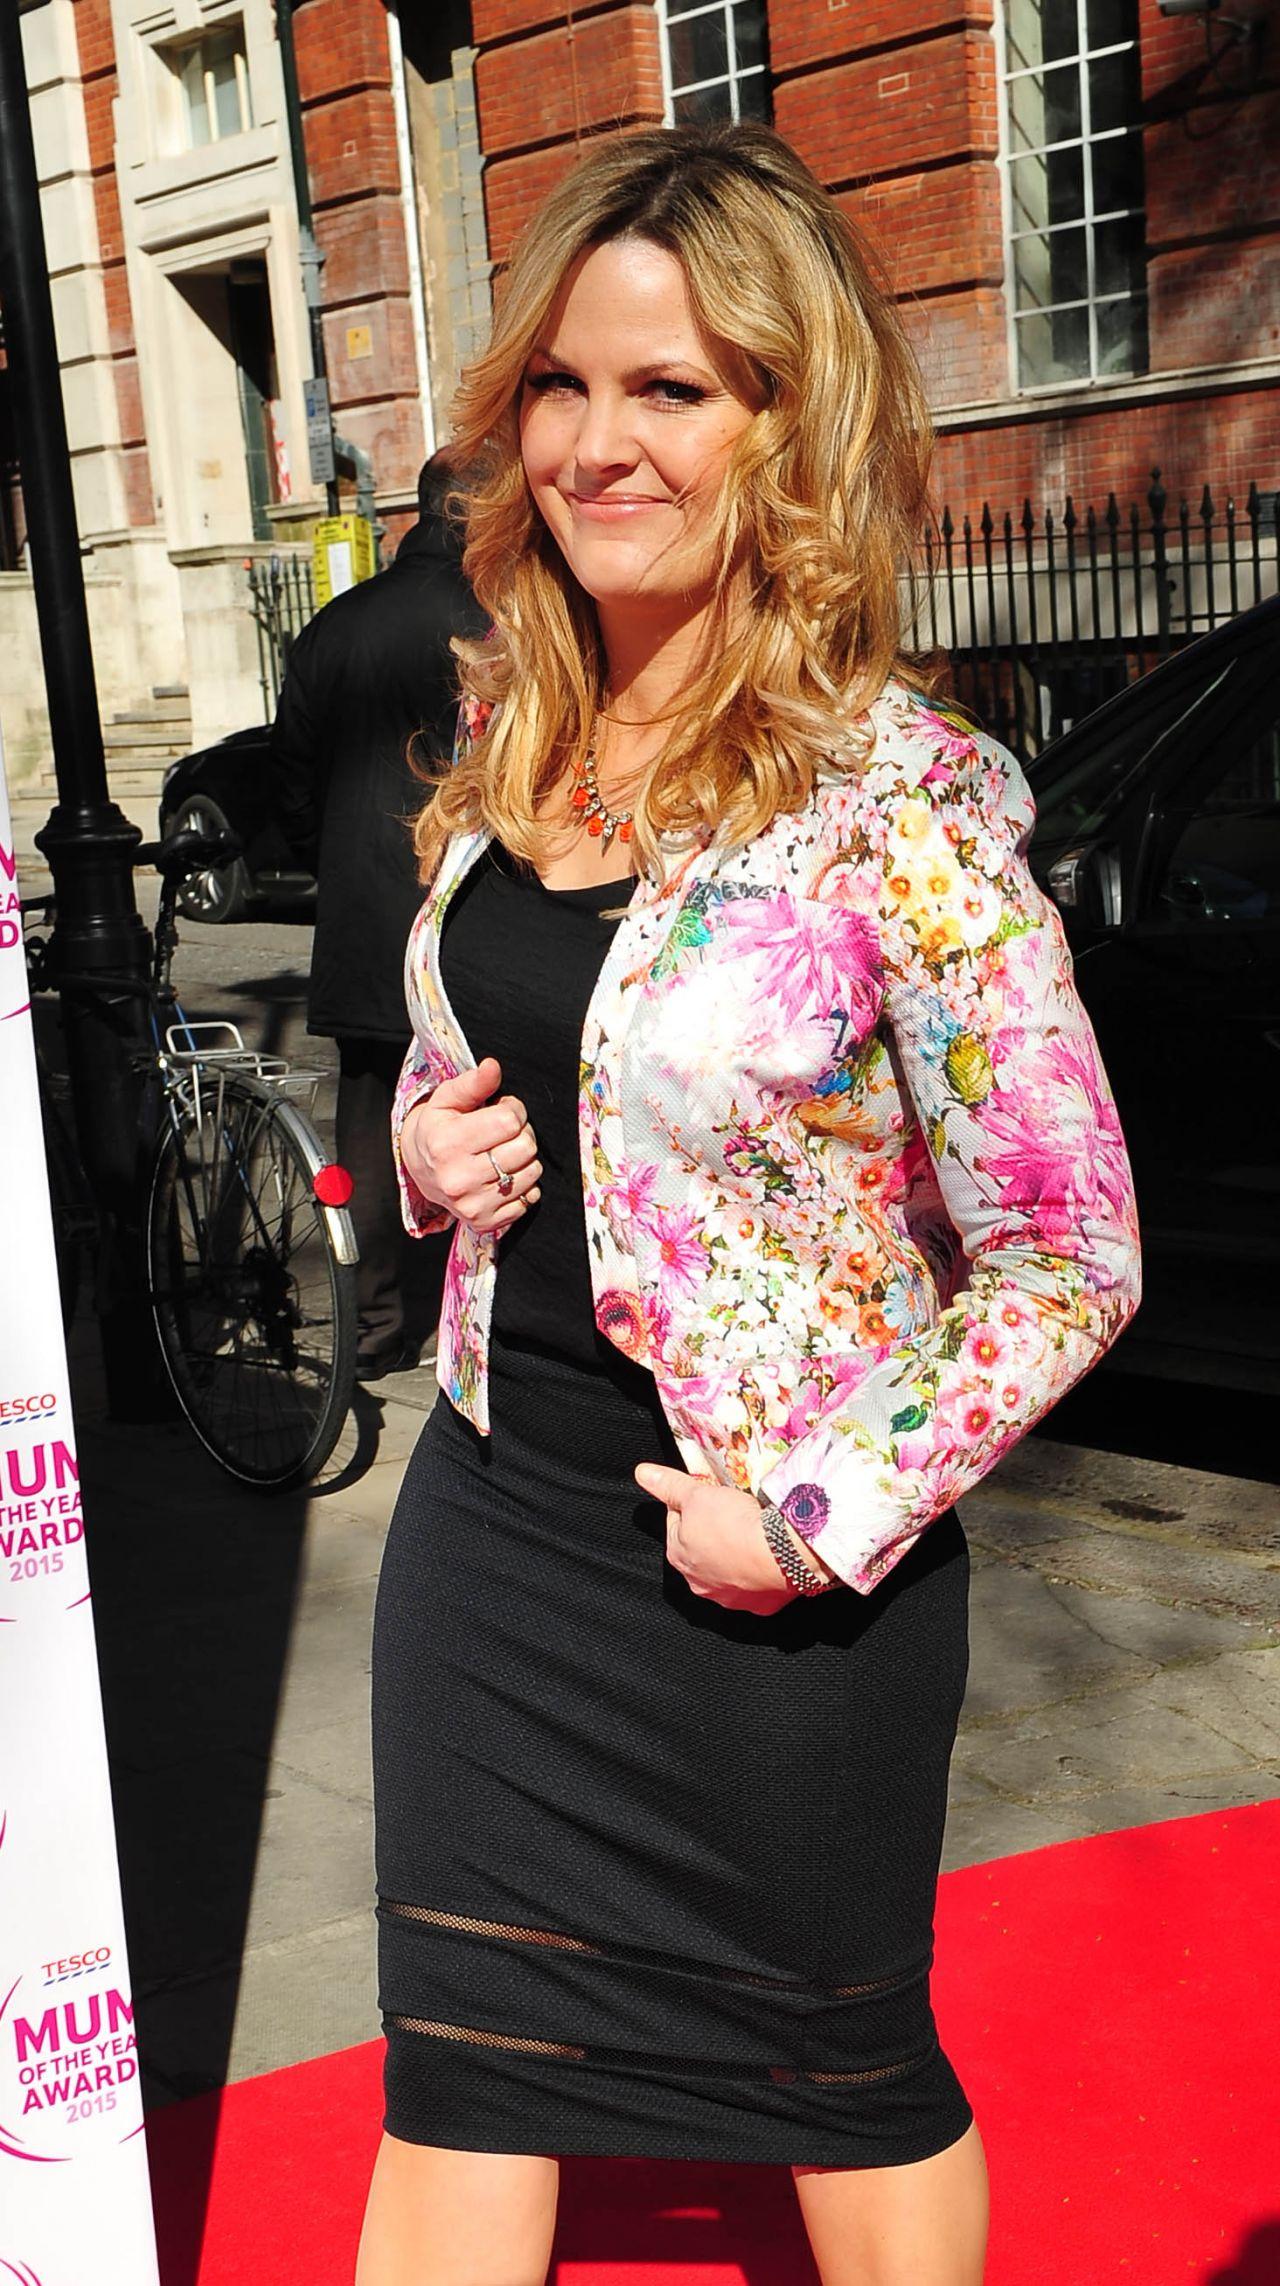 ... - 2015 Fotos de Famosos - Tesco Mum Of The Year Awards in London Awards